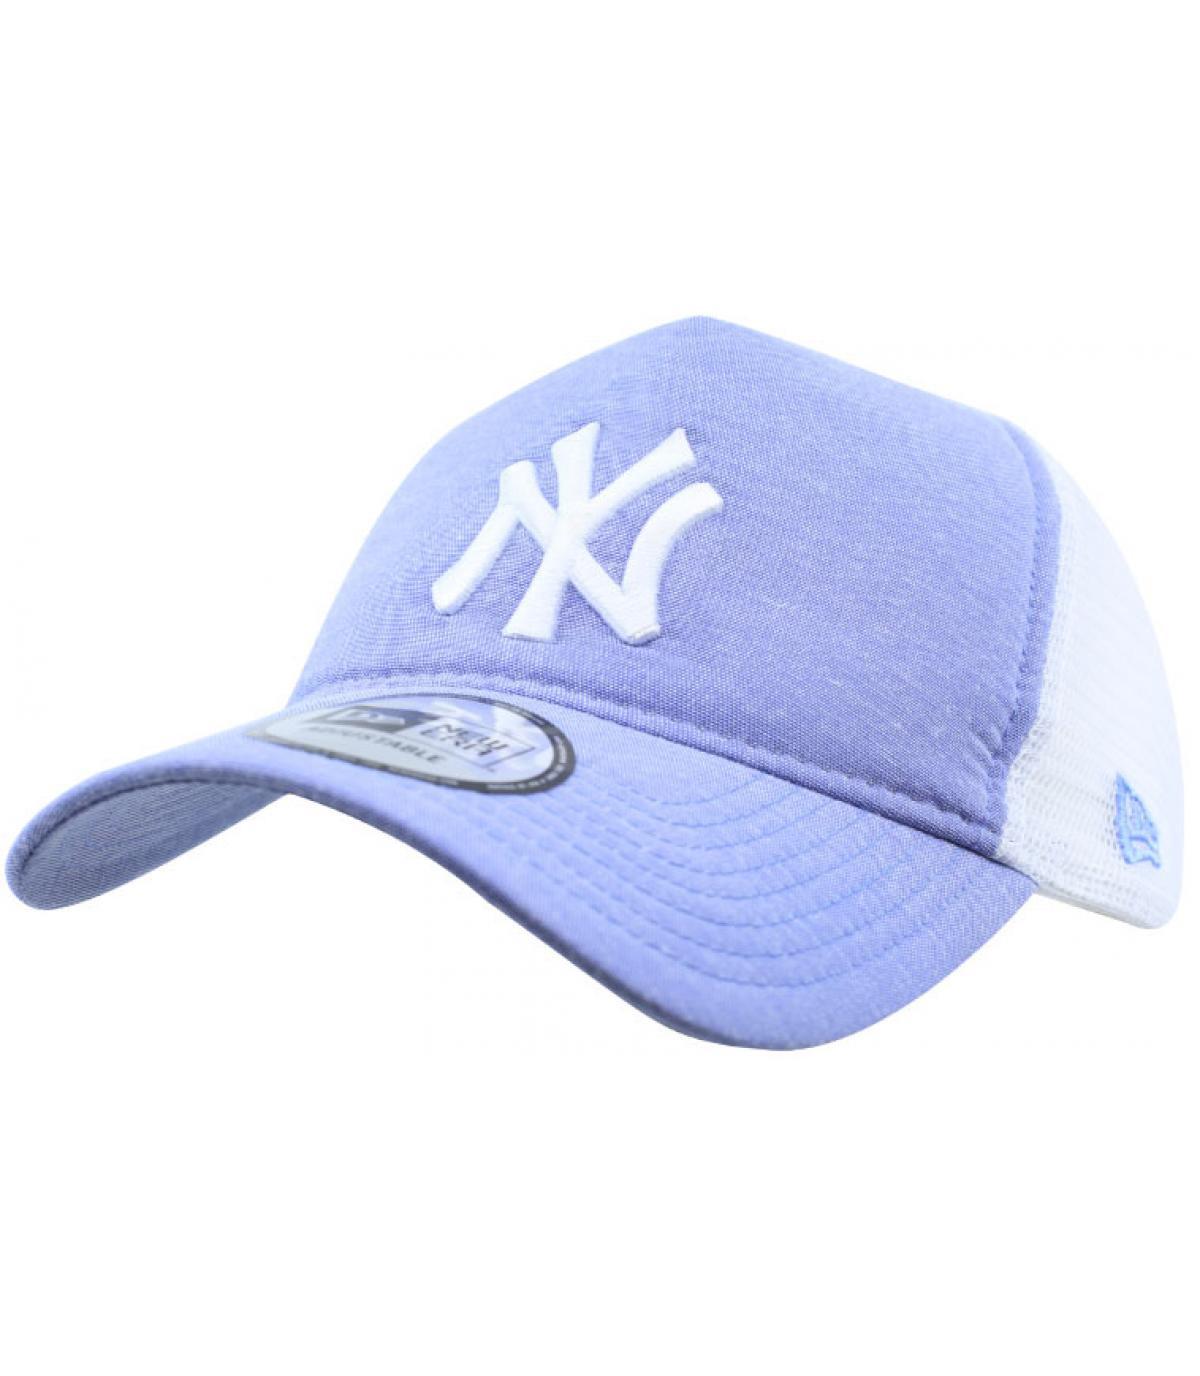 Dettagli MLB Oxford NY sky blue - image 2